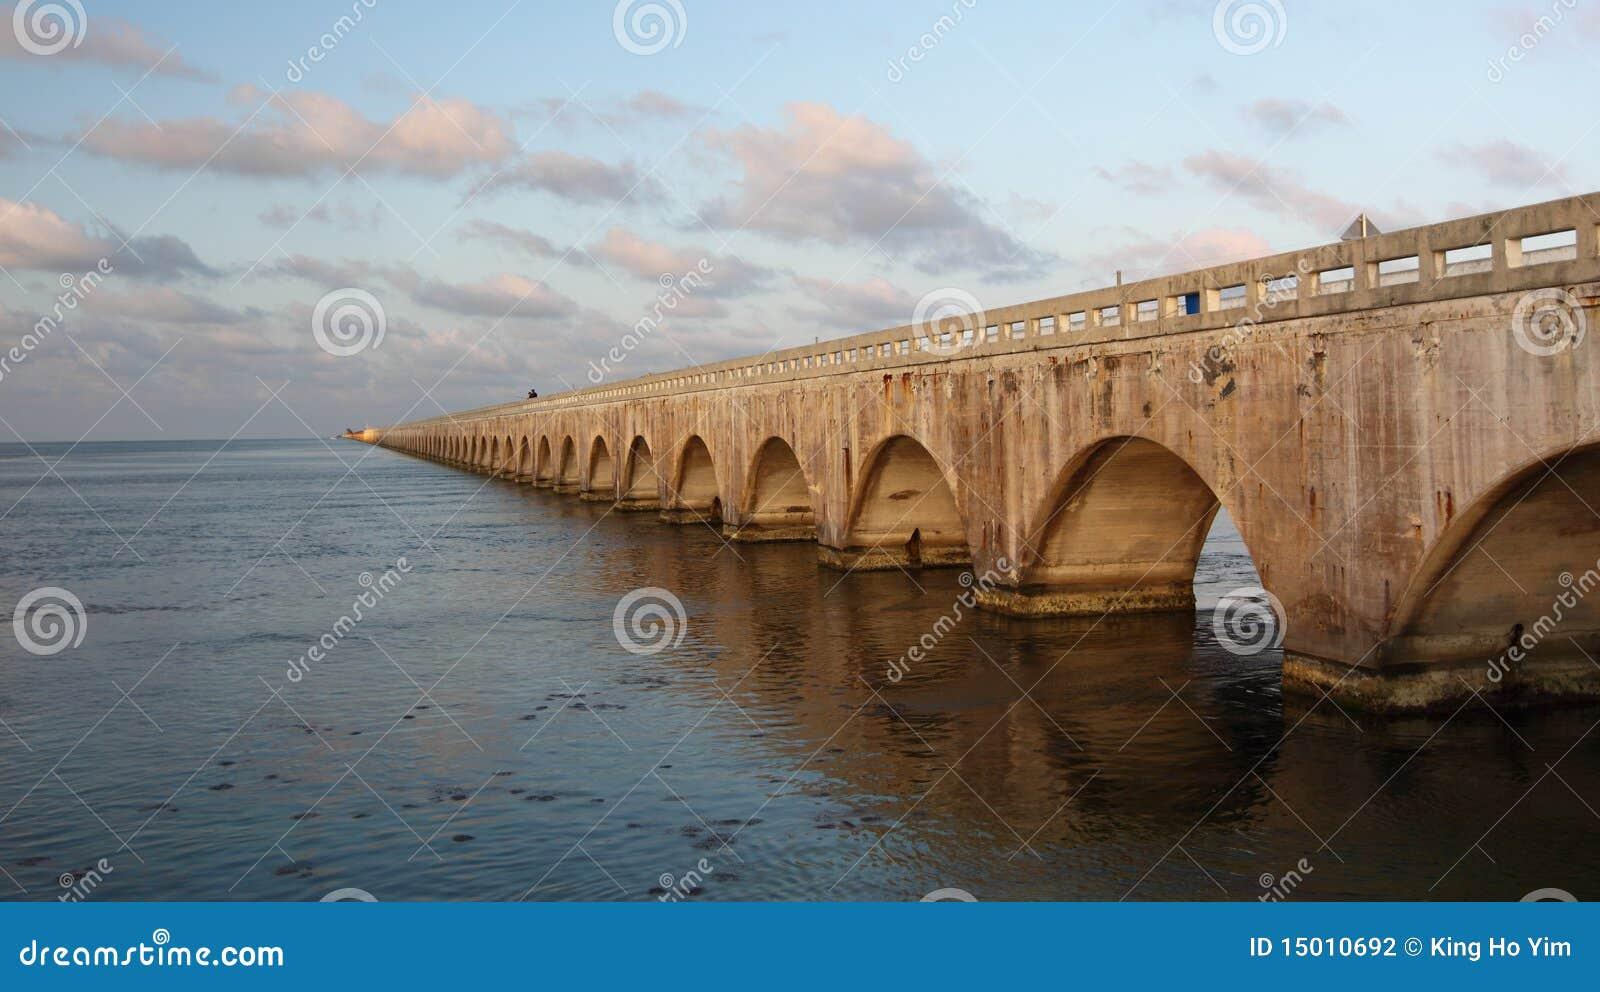 Old seven mile bridge in florida keys stock photography for Florida keys bridge fishing